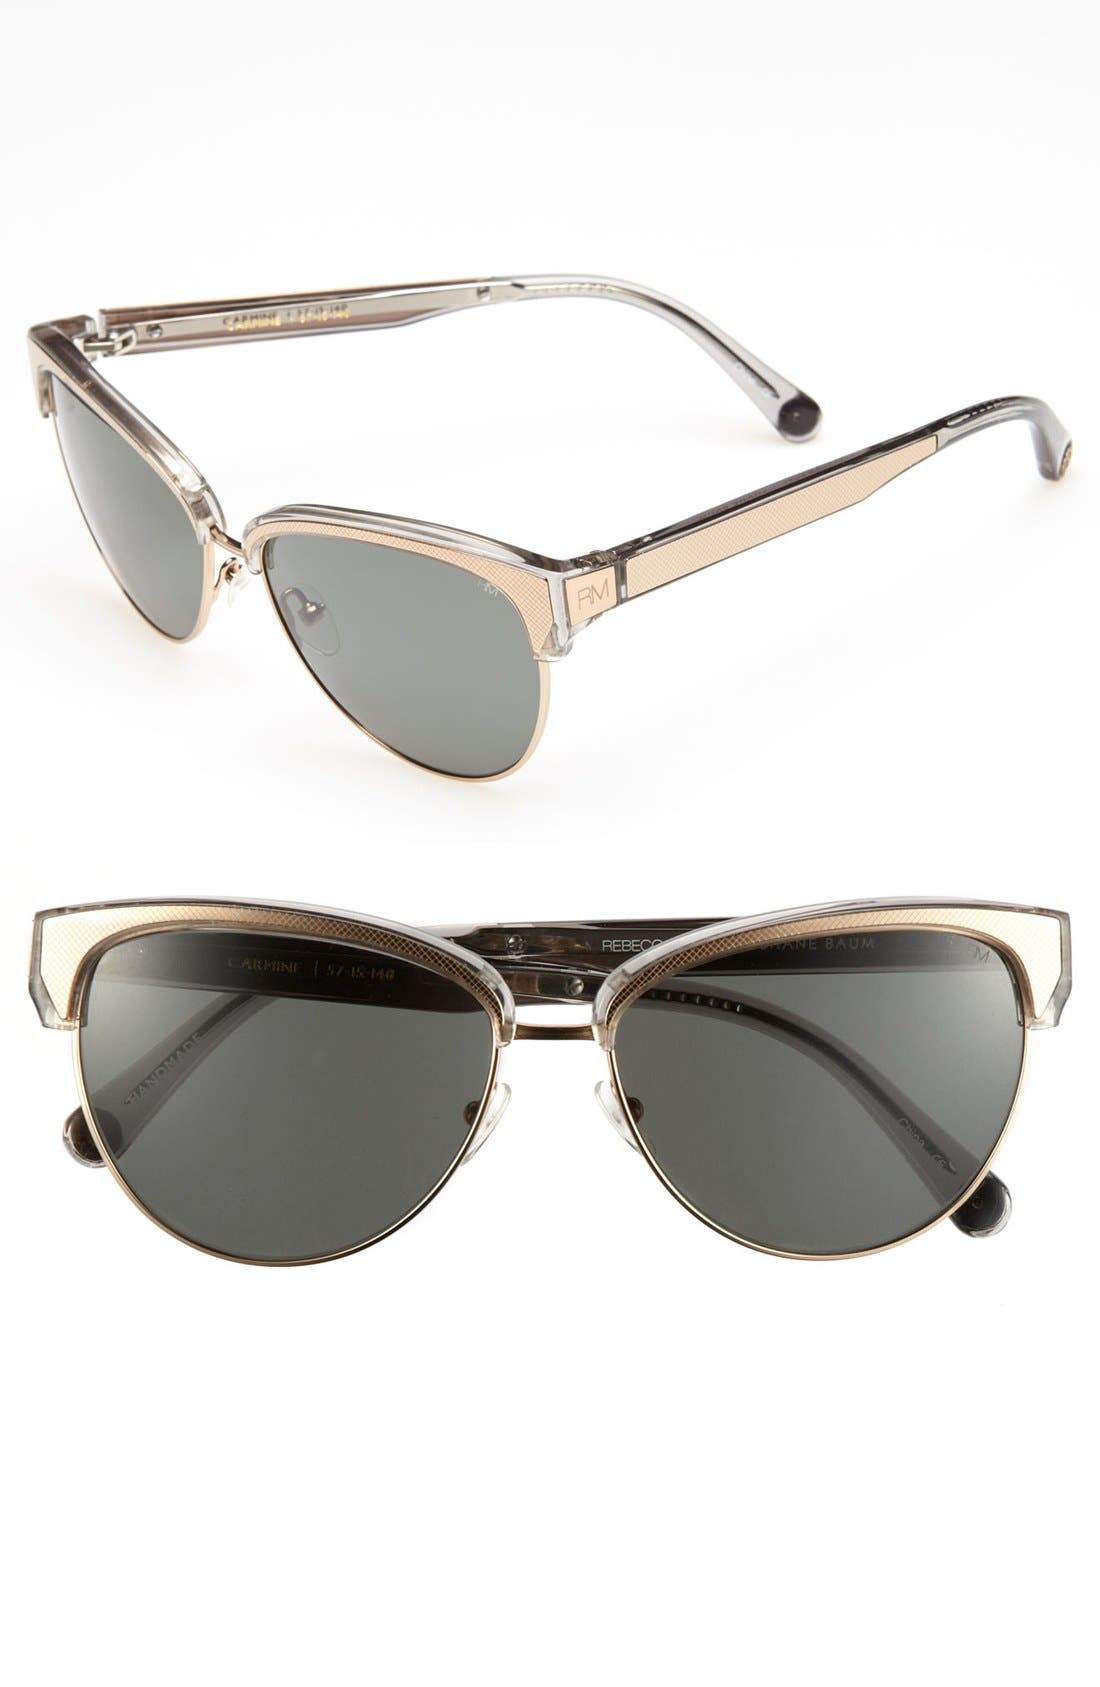 Main Image - Rebecca Minkoff 'Carmine' Sunglasses